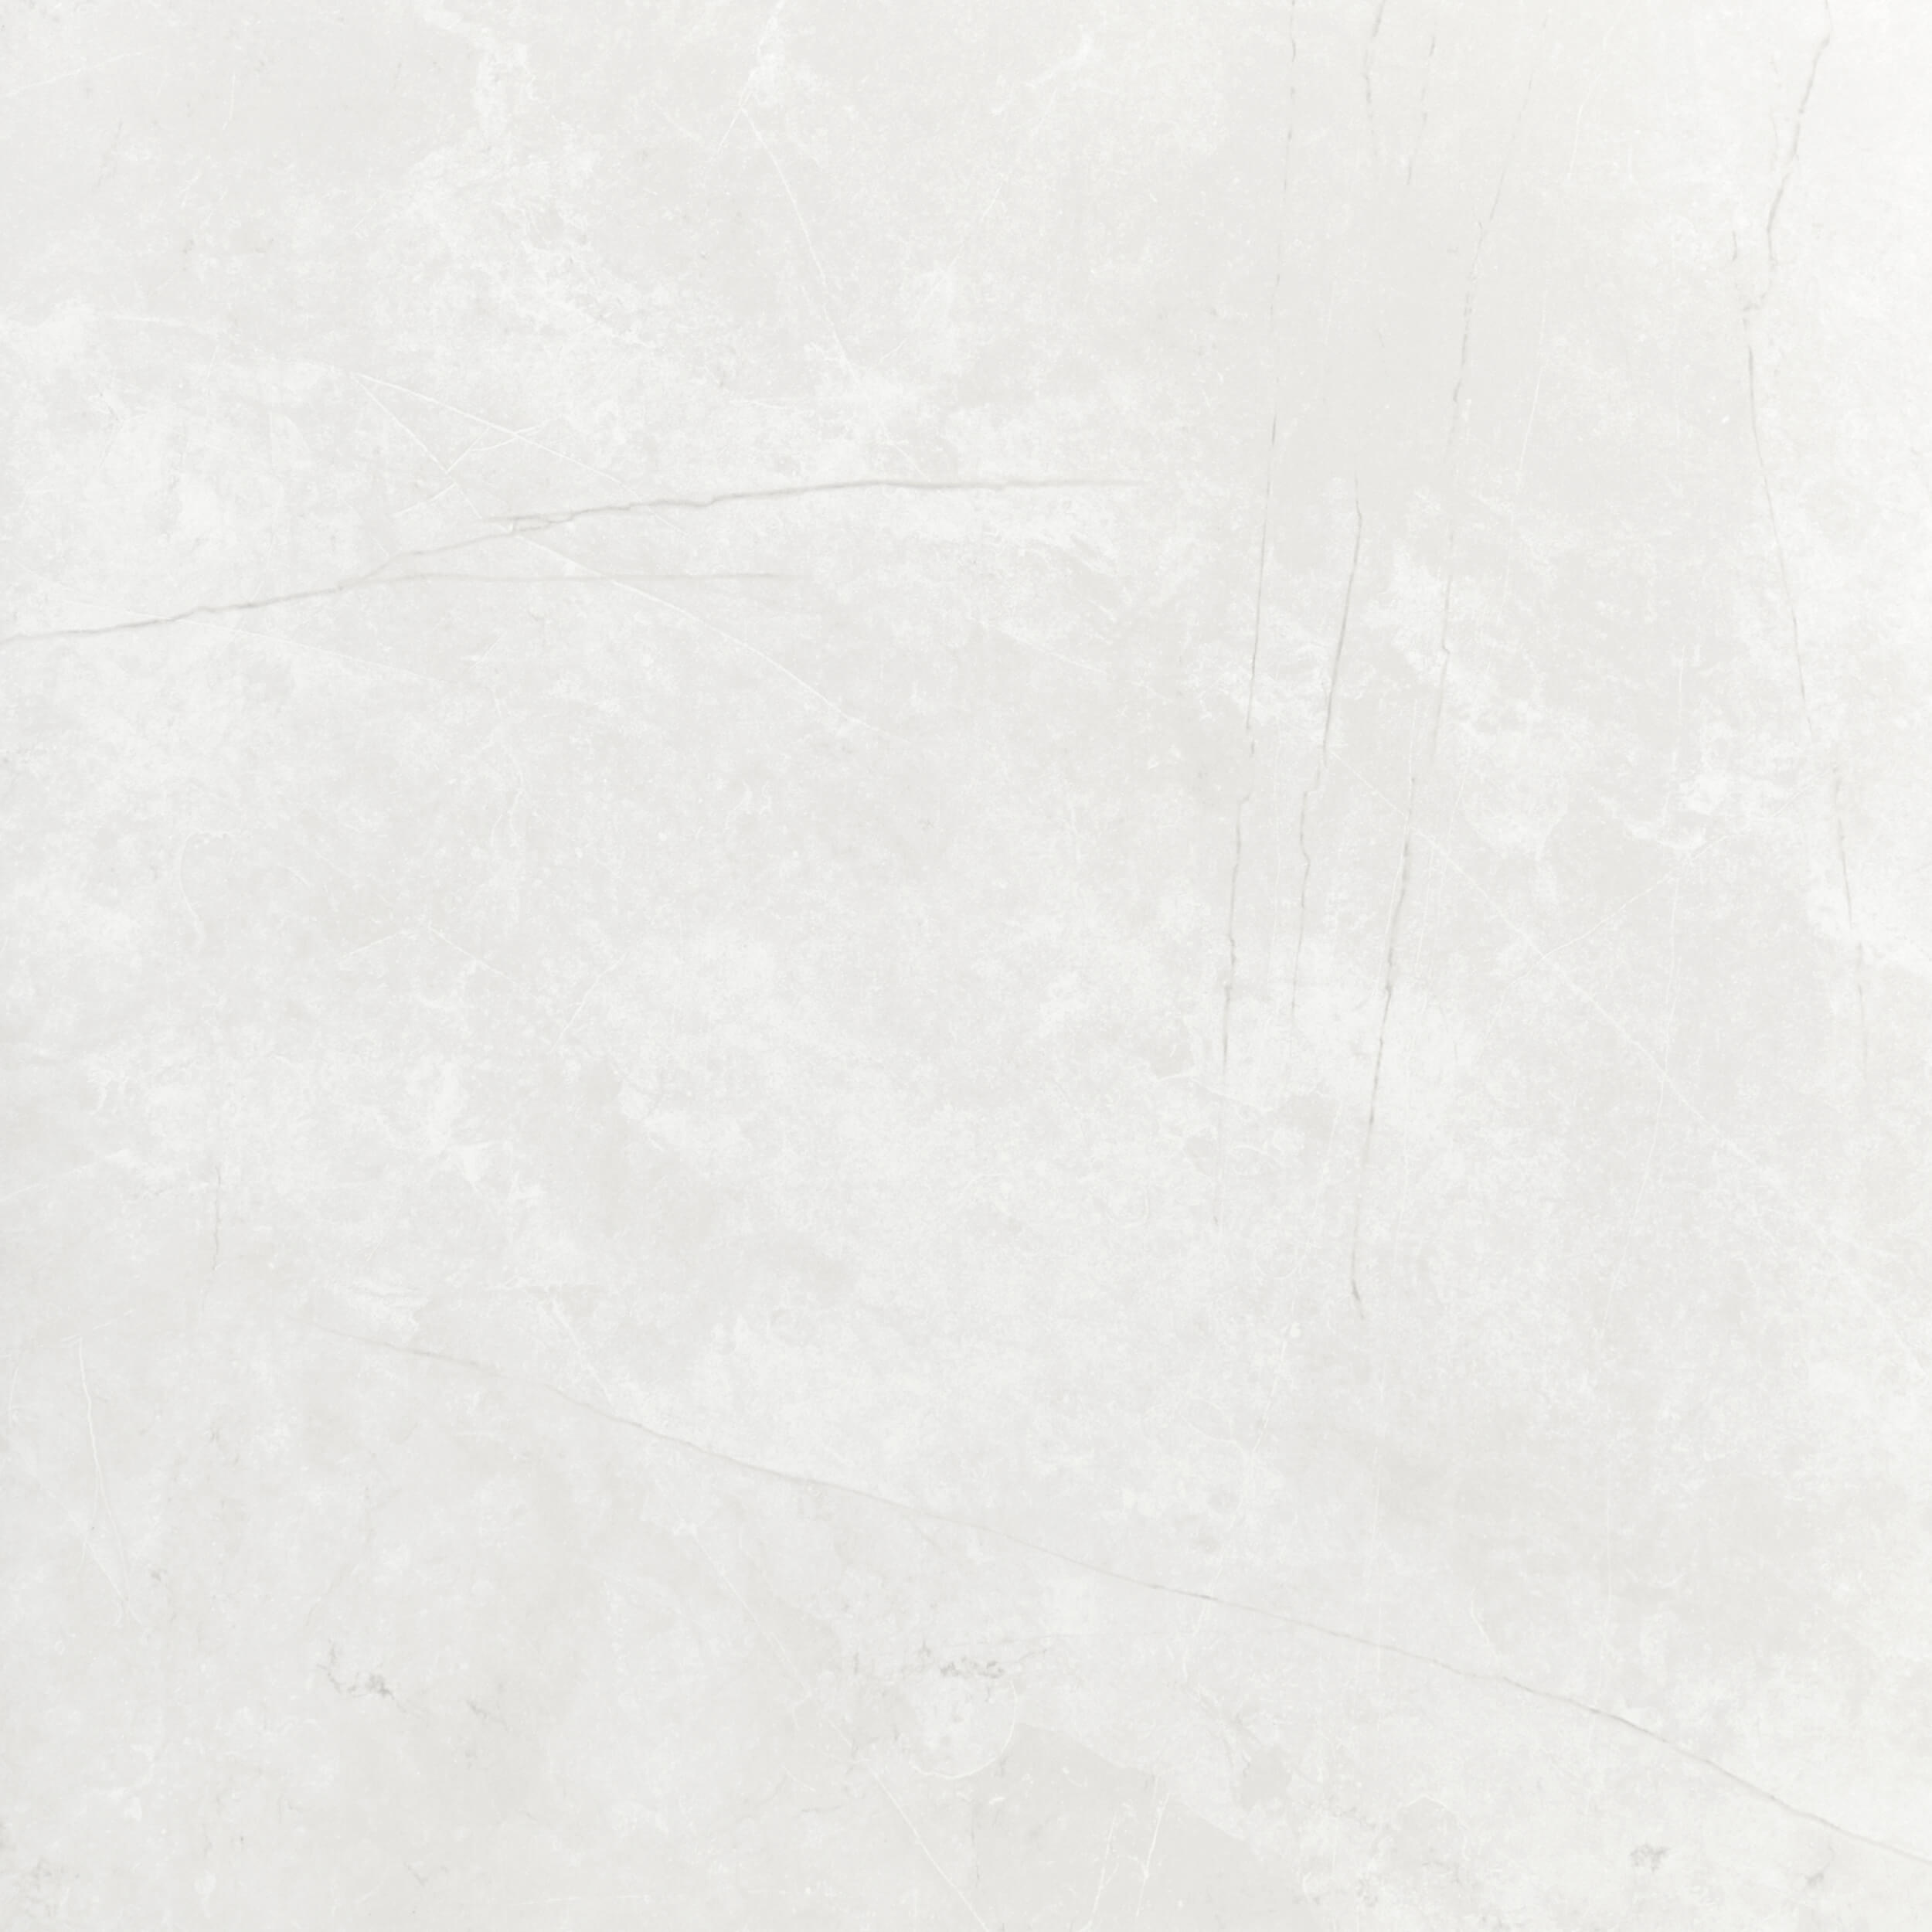 Настенная плитка Azulev Delice Blanco Mate Rect 29x89 (1,036) настенная плитка vives blanco mate 20x20